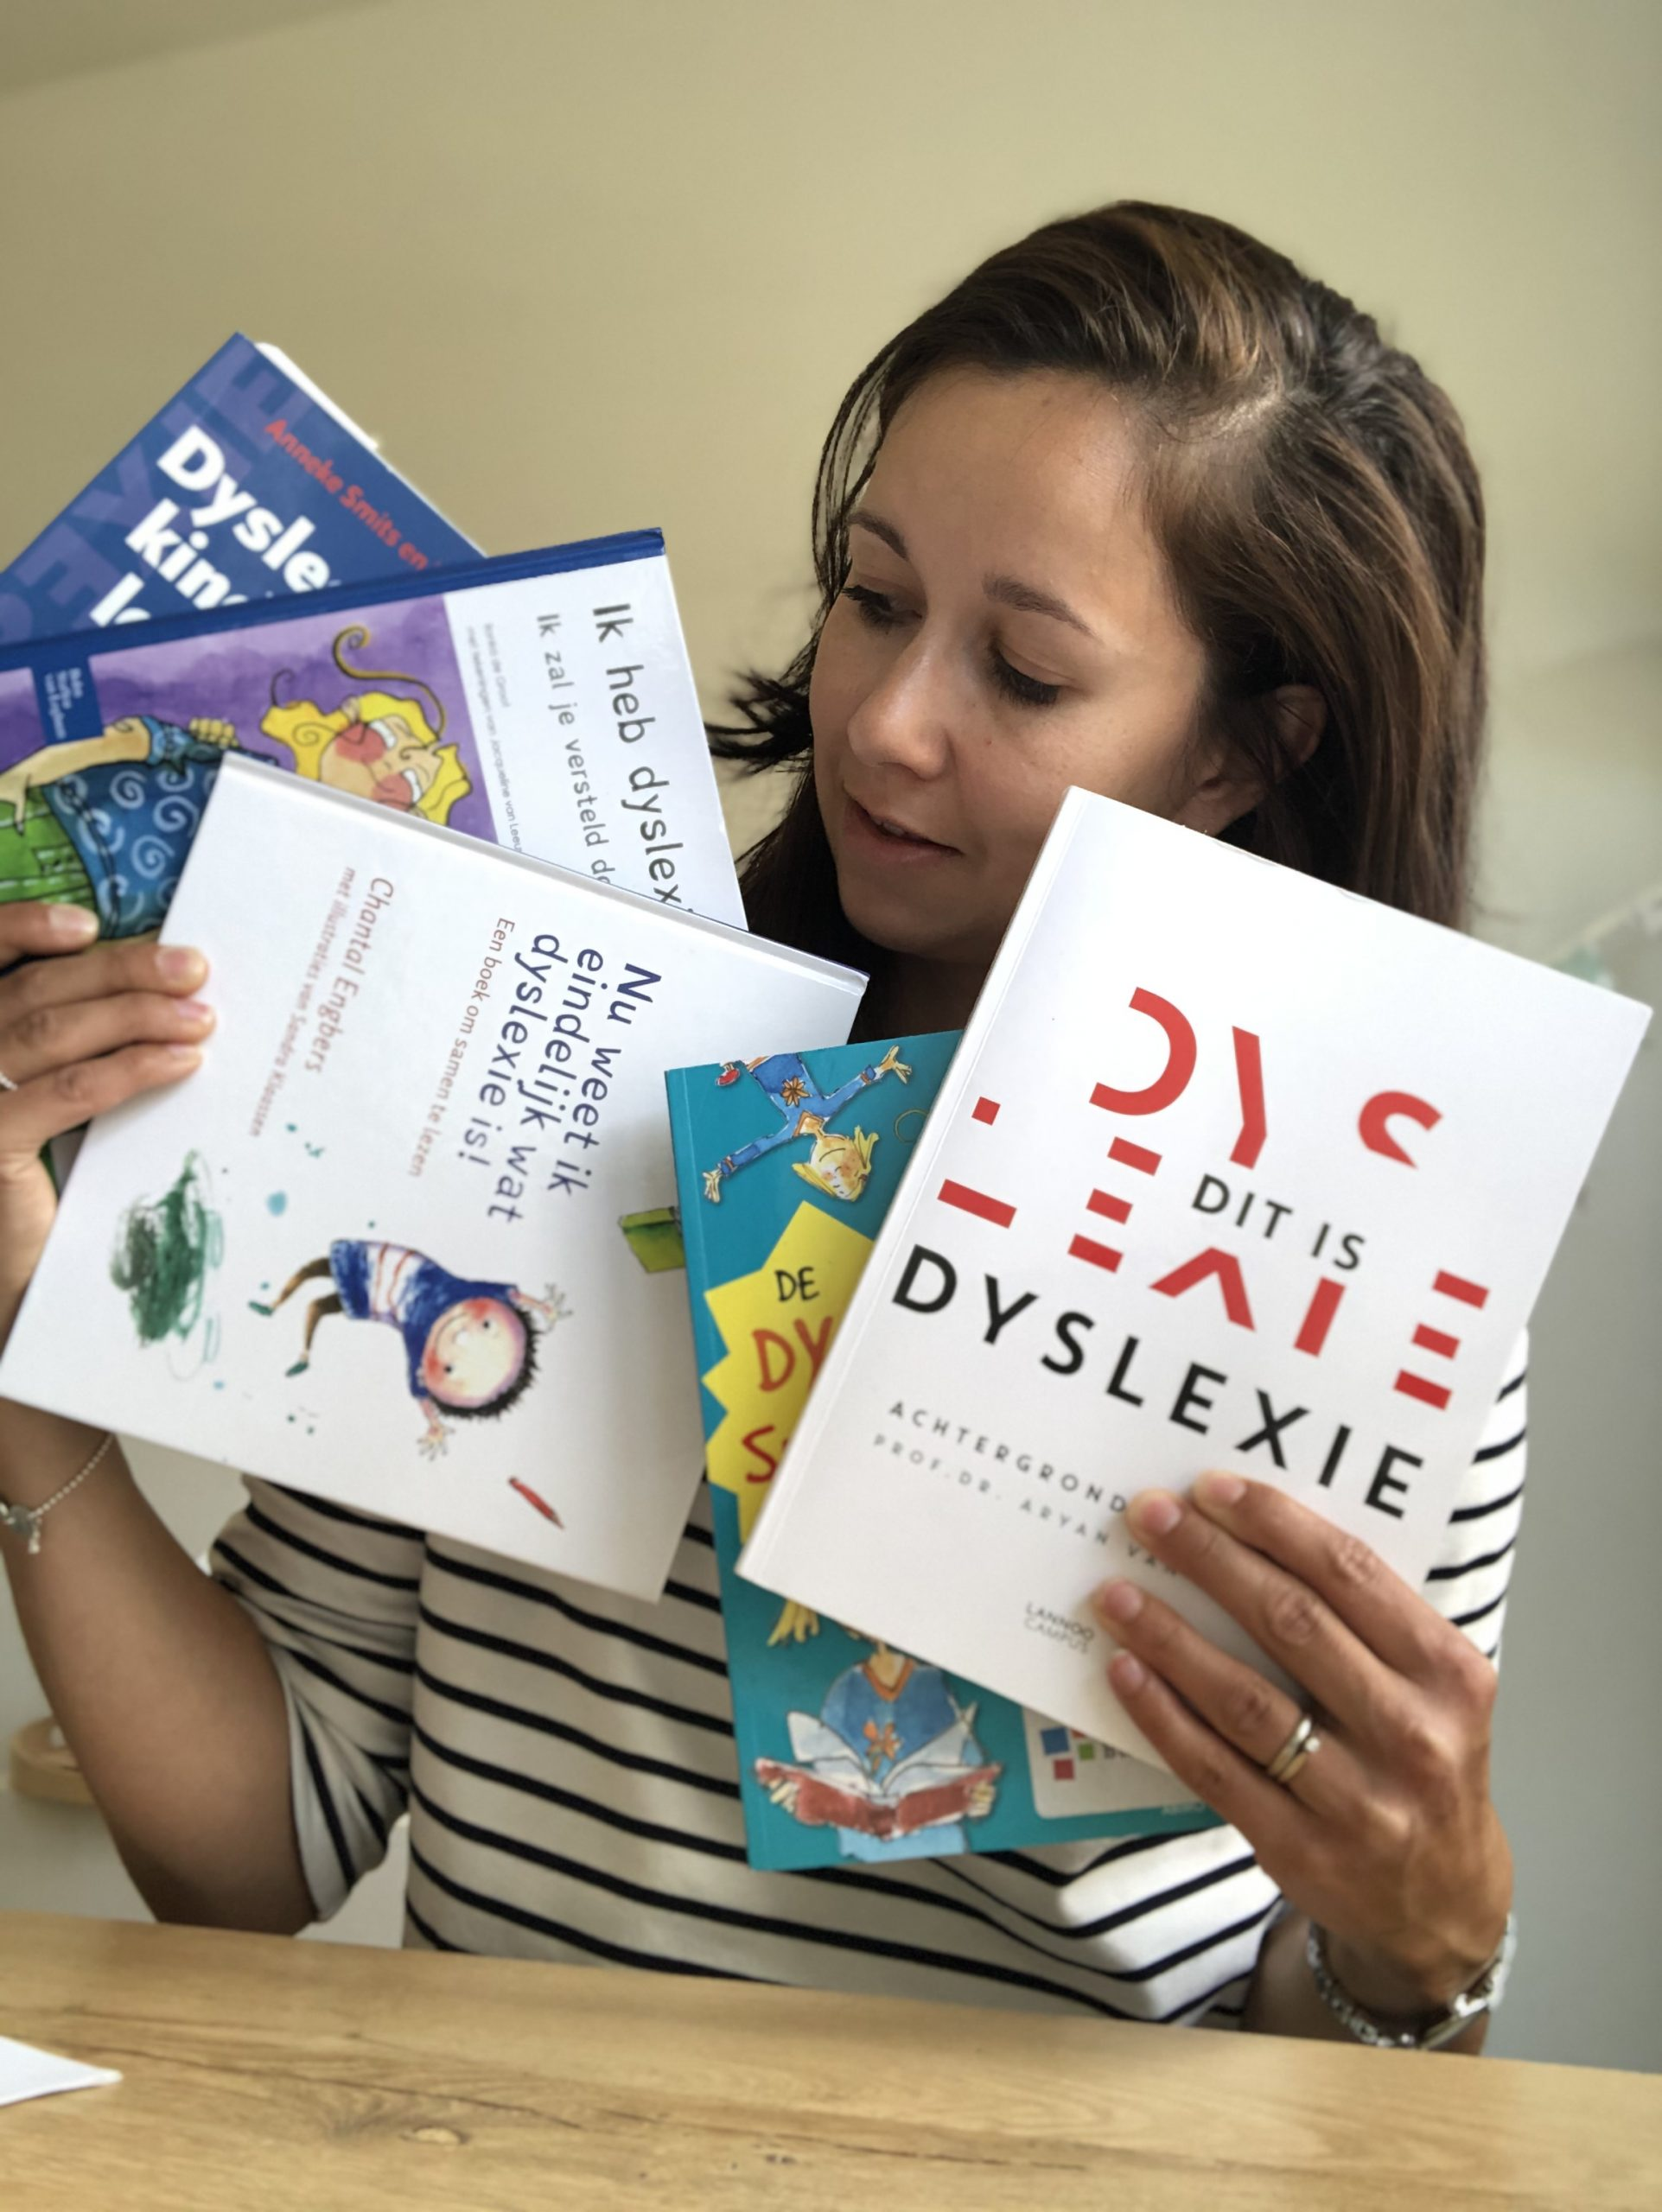 Tien boeken over dyslexie - Dyslexie Utrecht